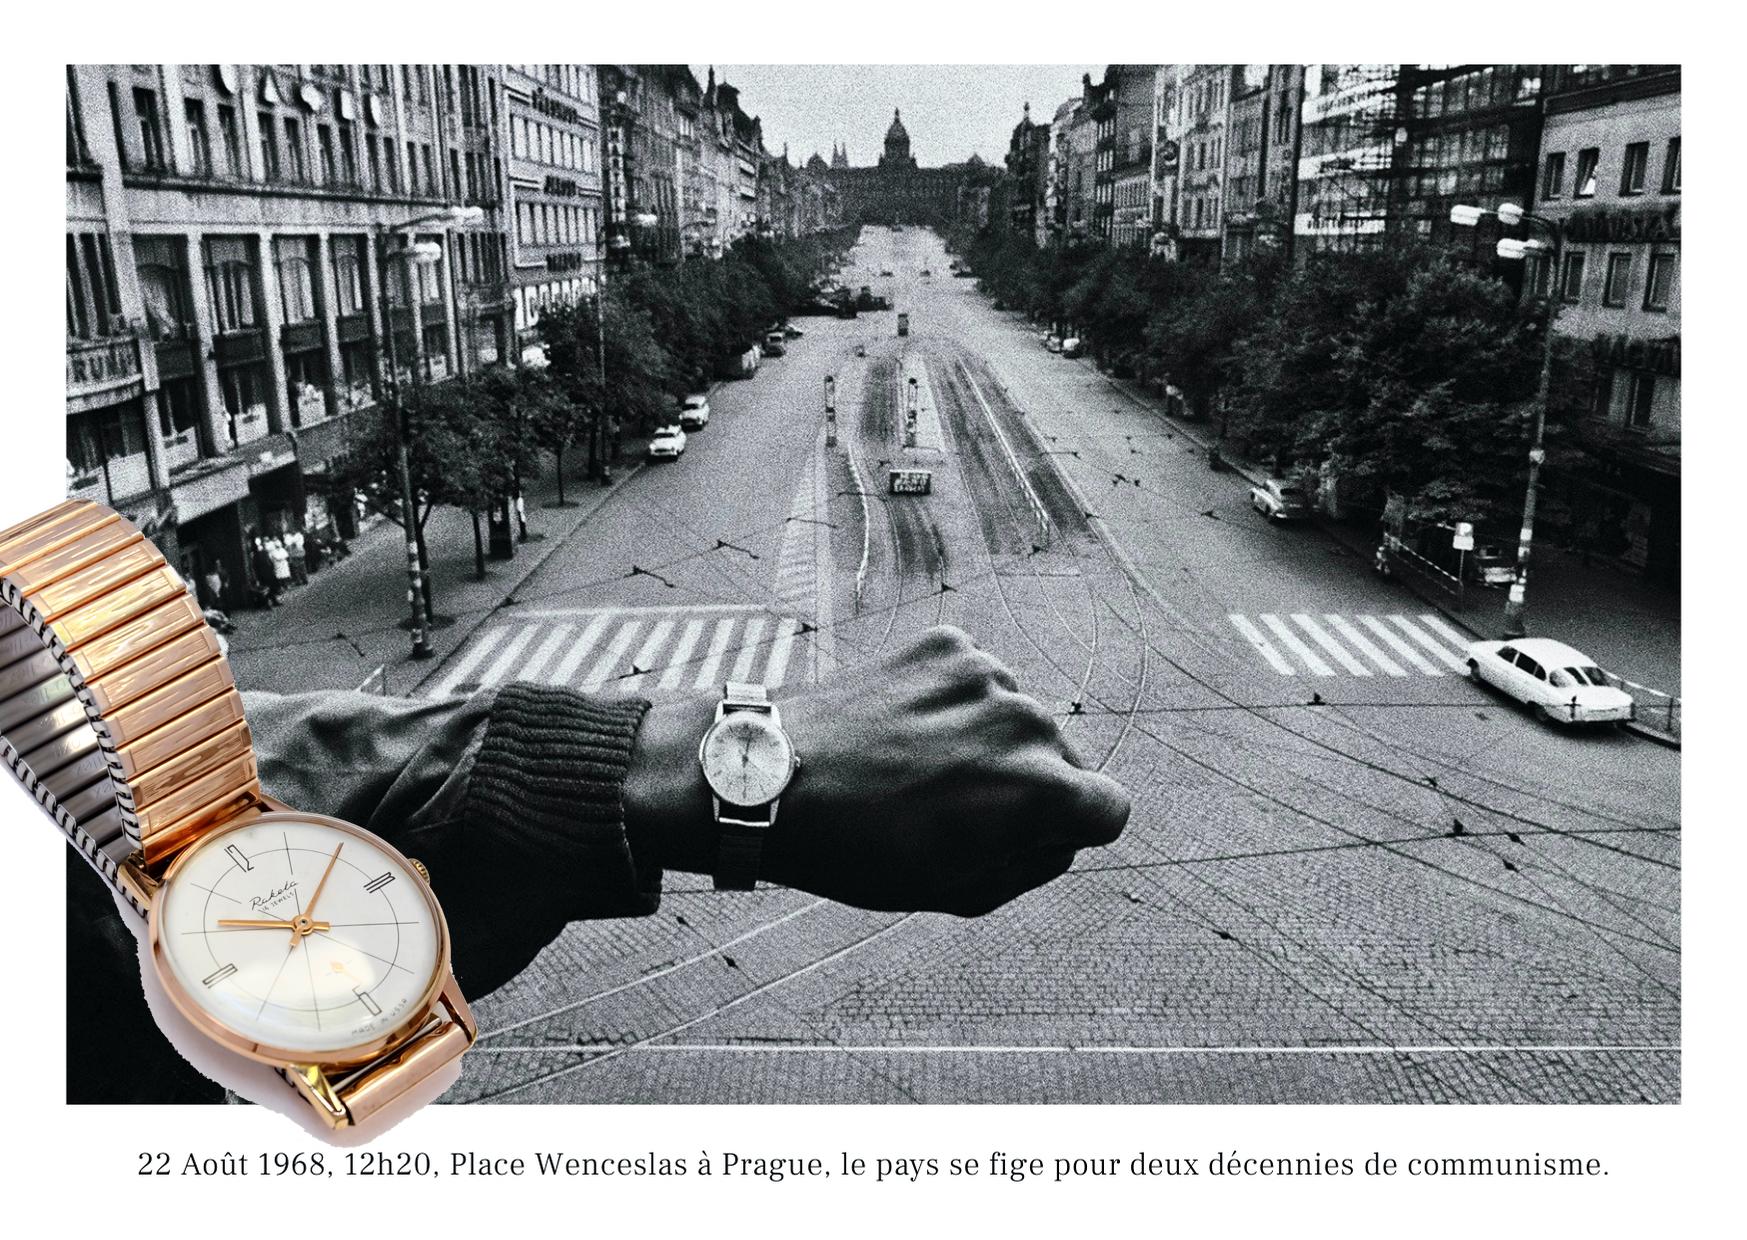 Histoire Josef Koudelka montre centre pompidou photographie 1968 mai